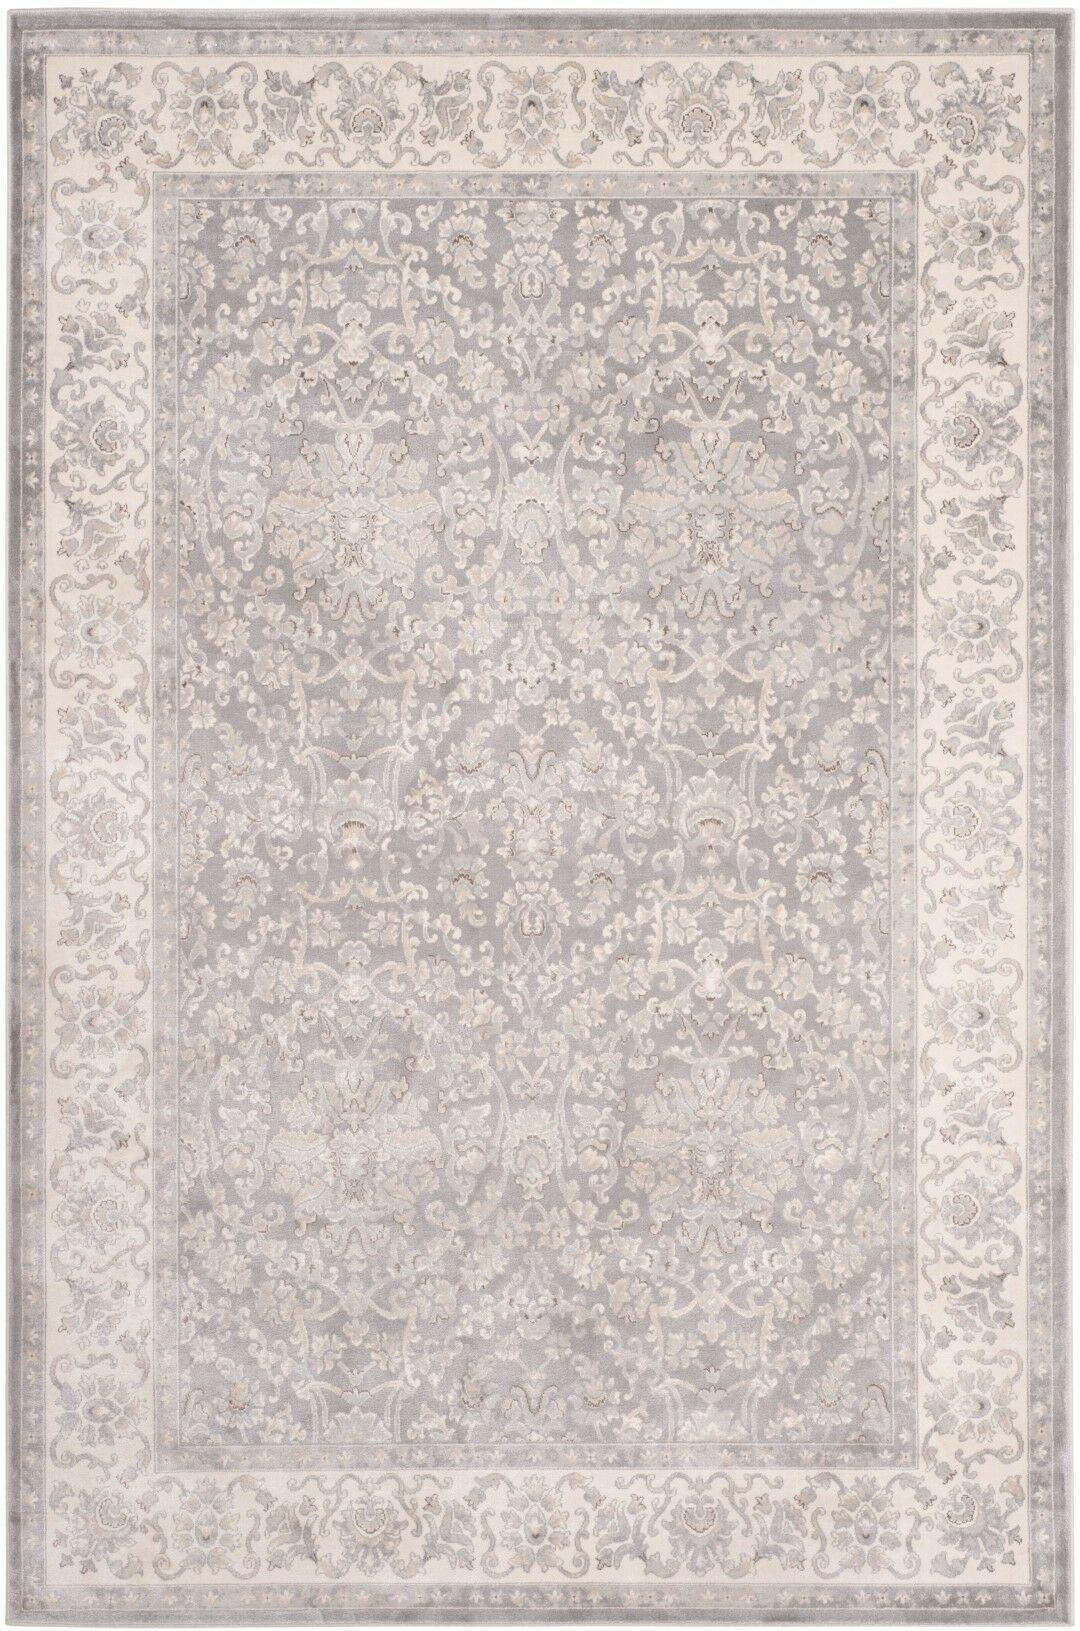 Setser Silver/Ivory Area Rug Rug Size: Rectangle 8' x 11'